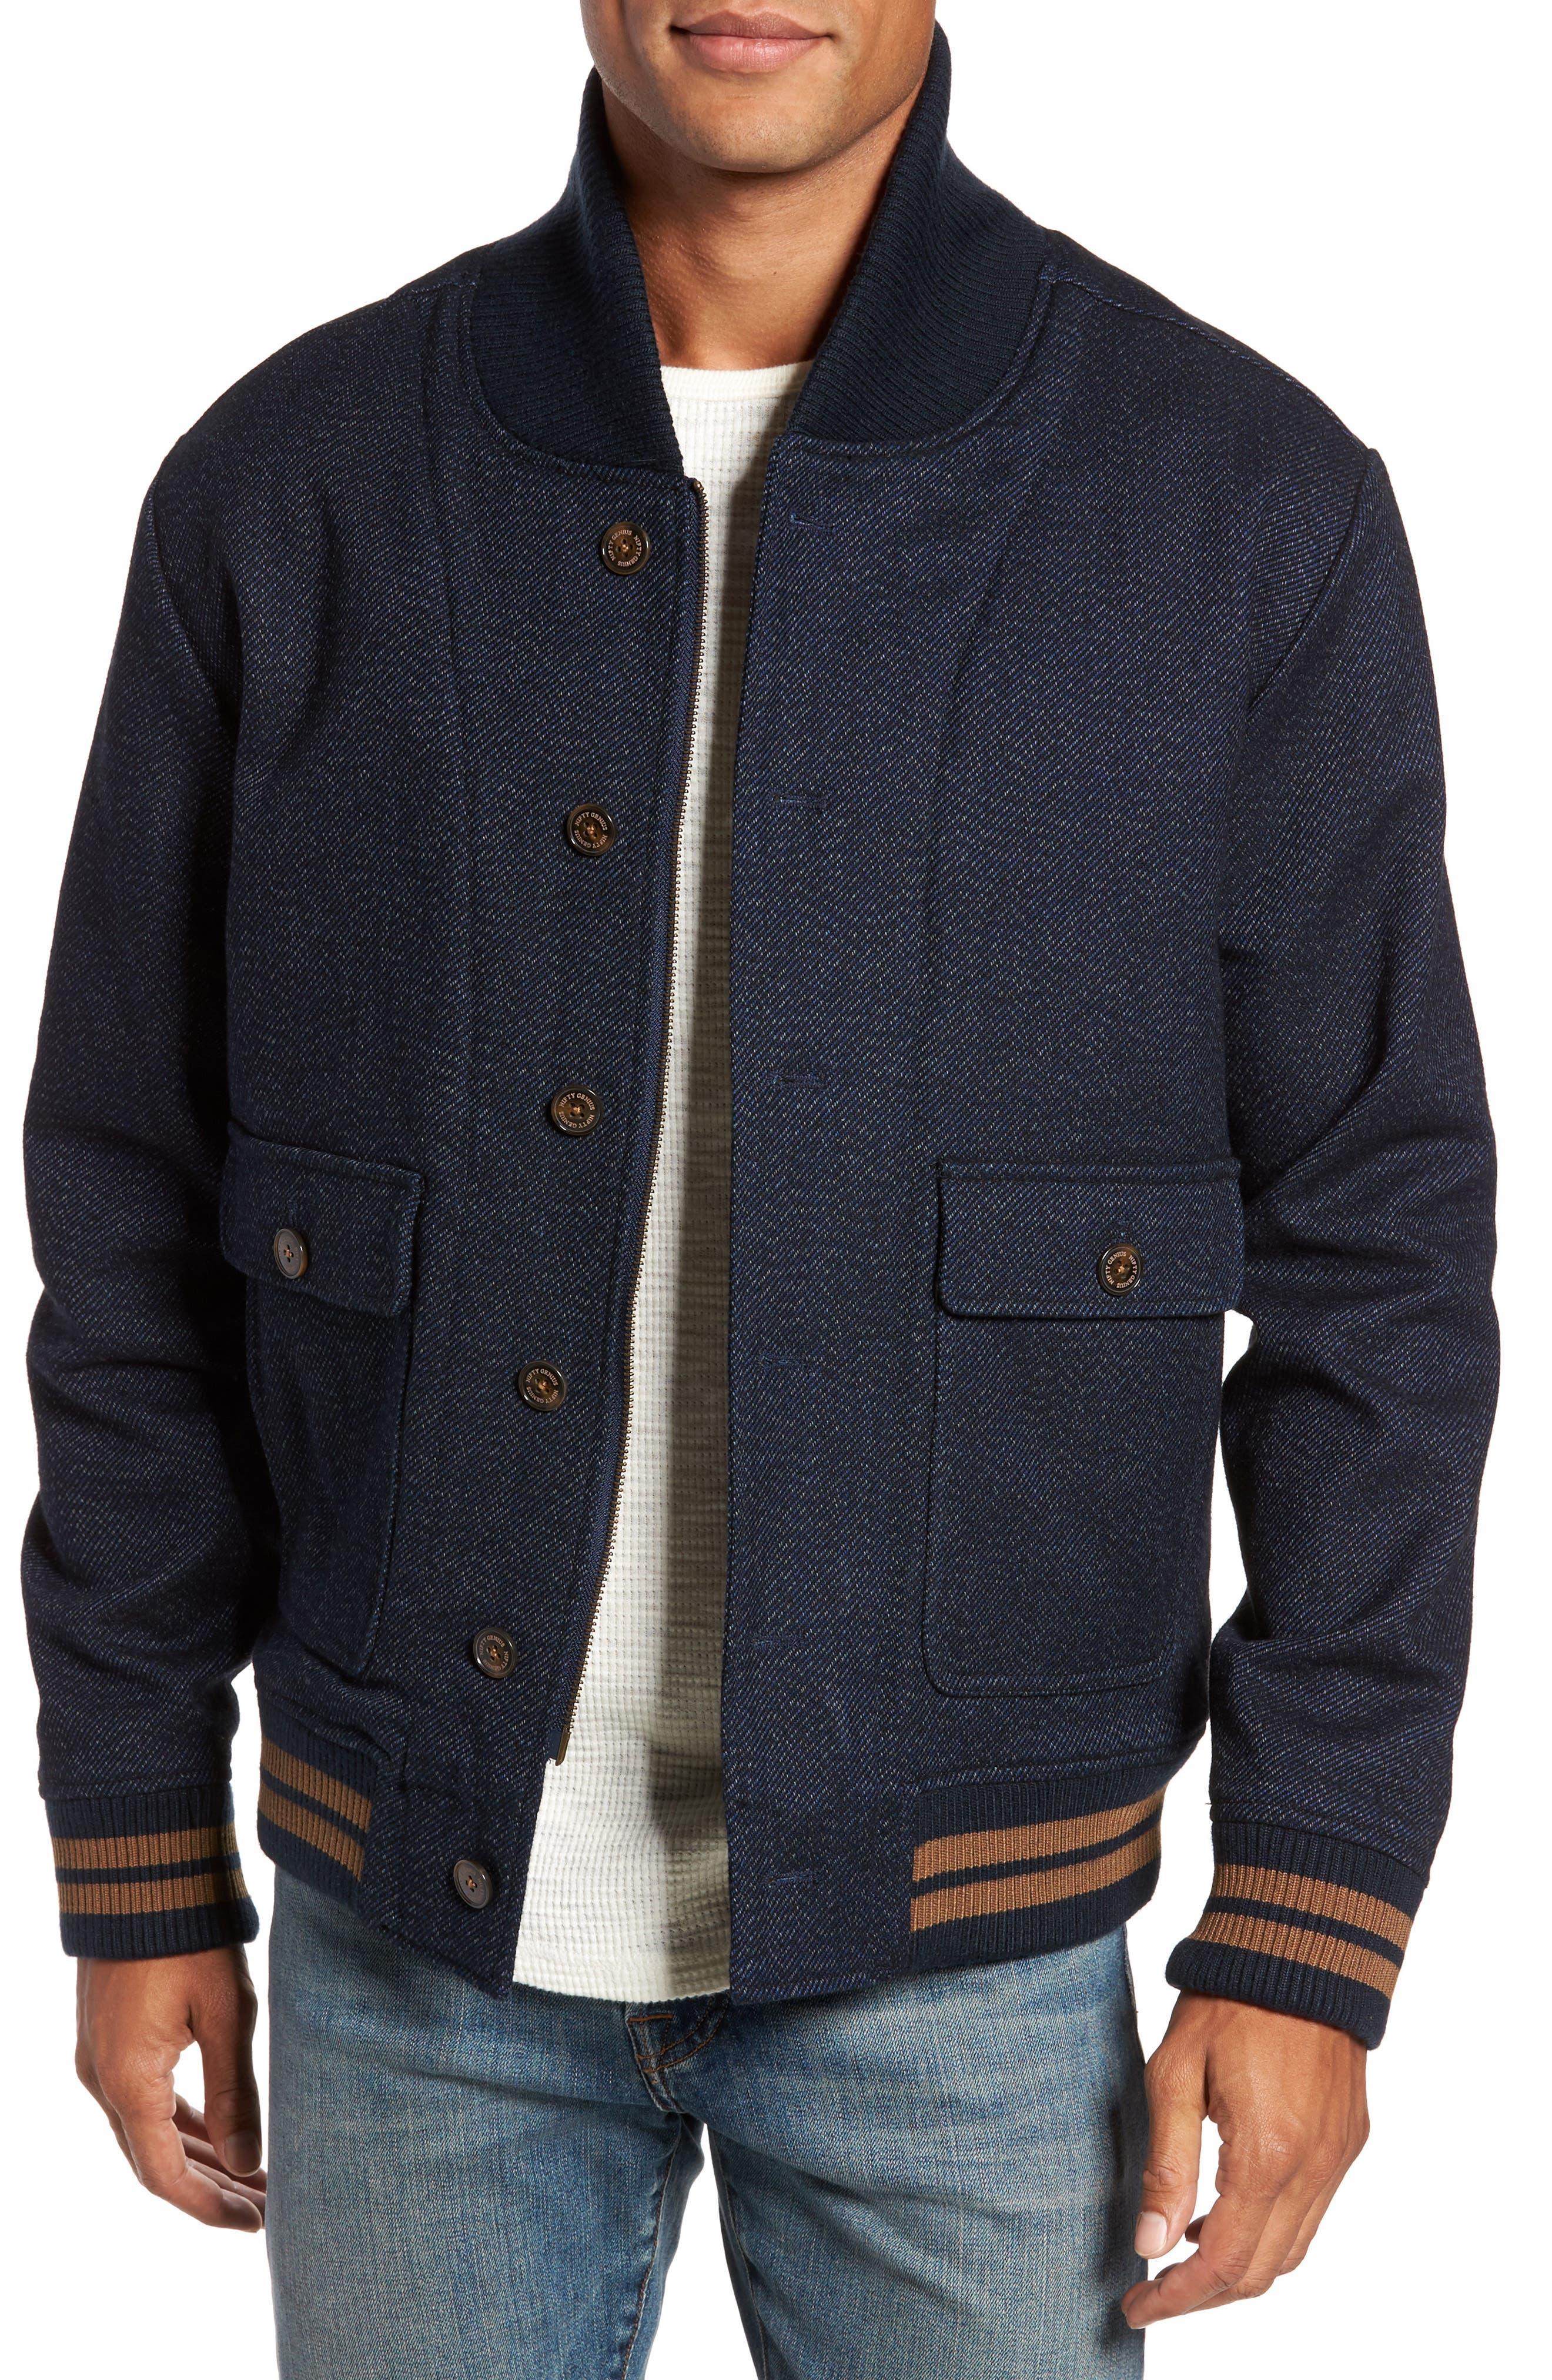 Roll Collar Varsity Jacket,                             Main thumbnail 1, color,                             401